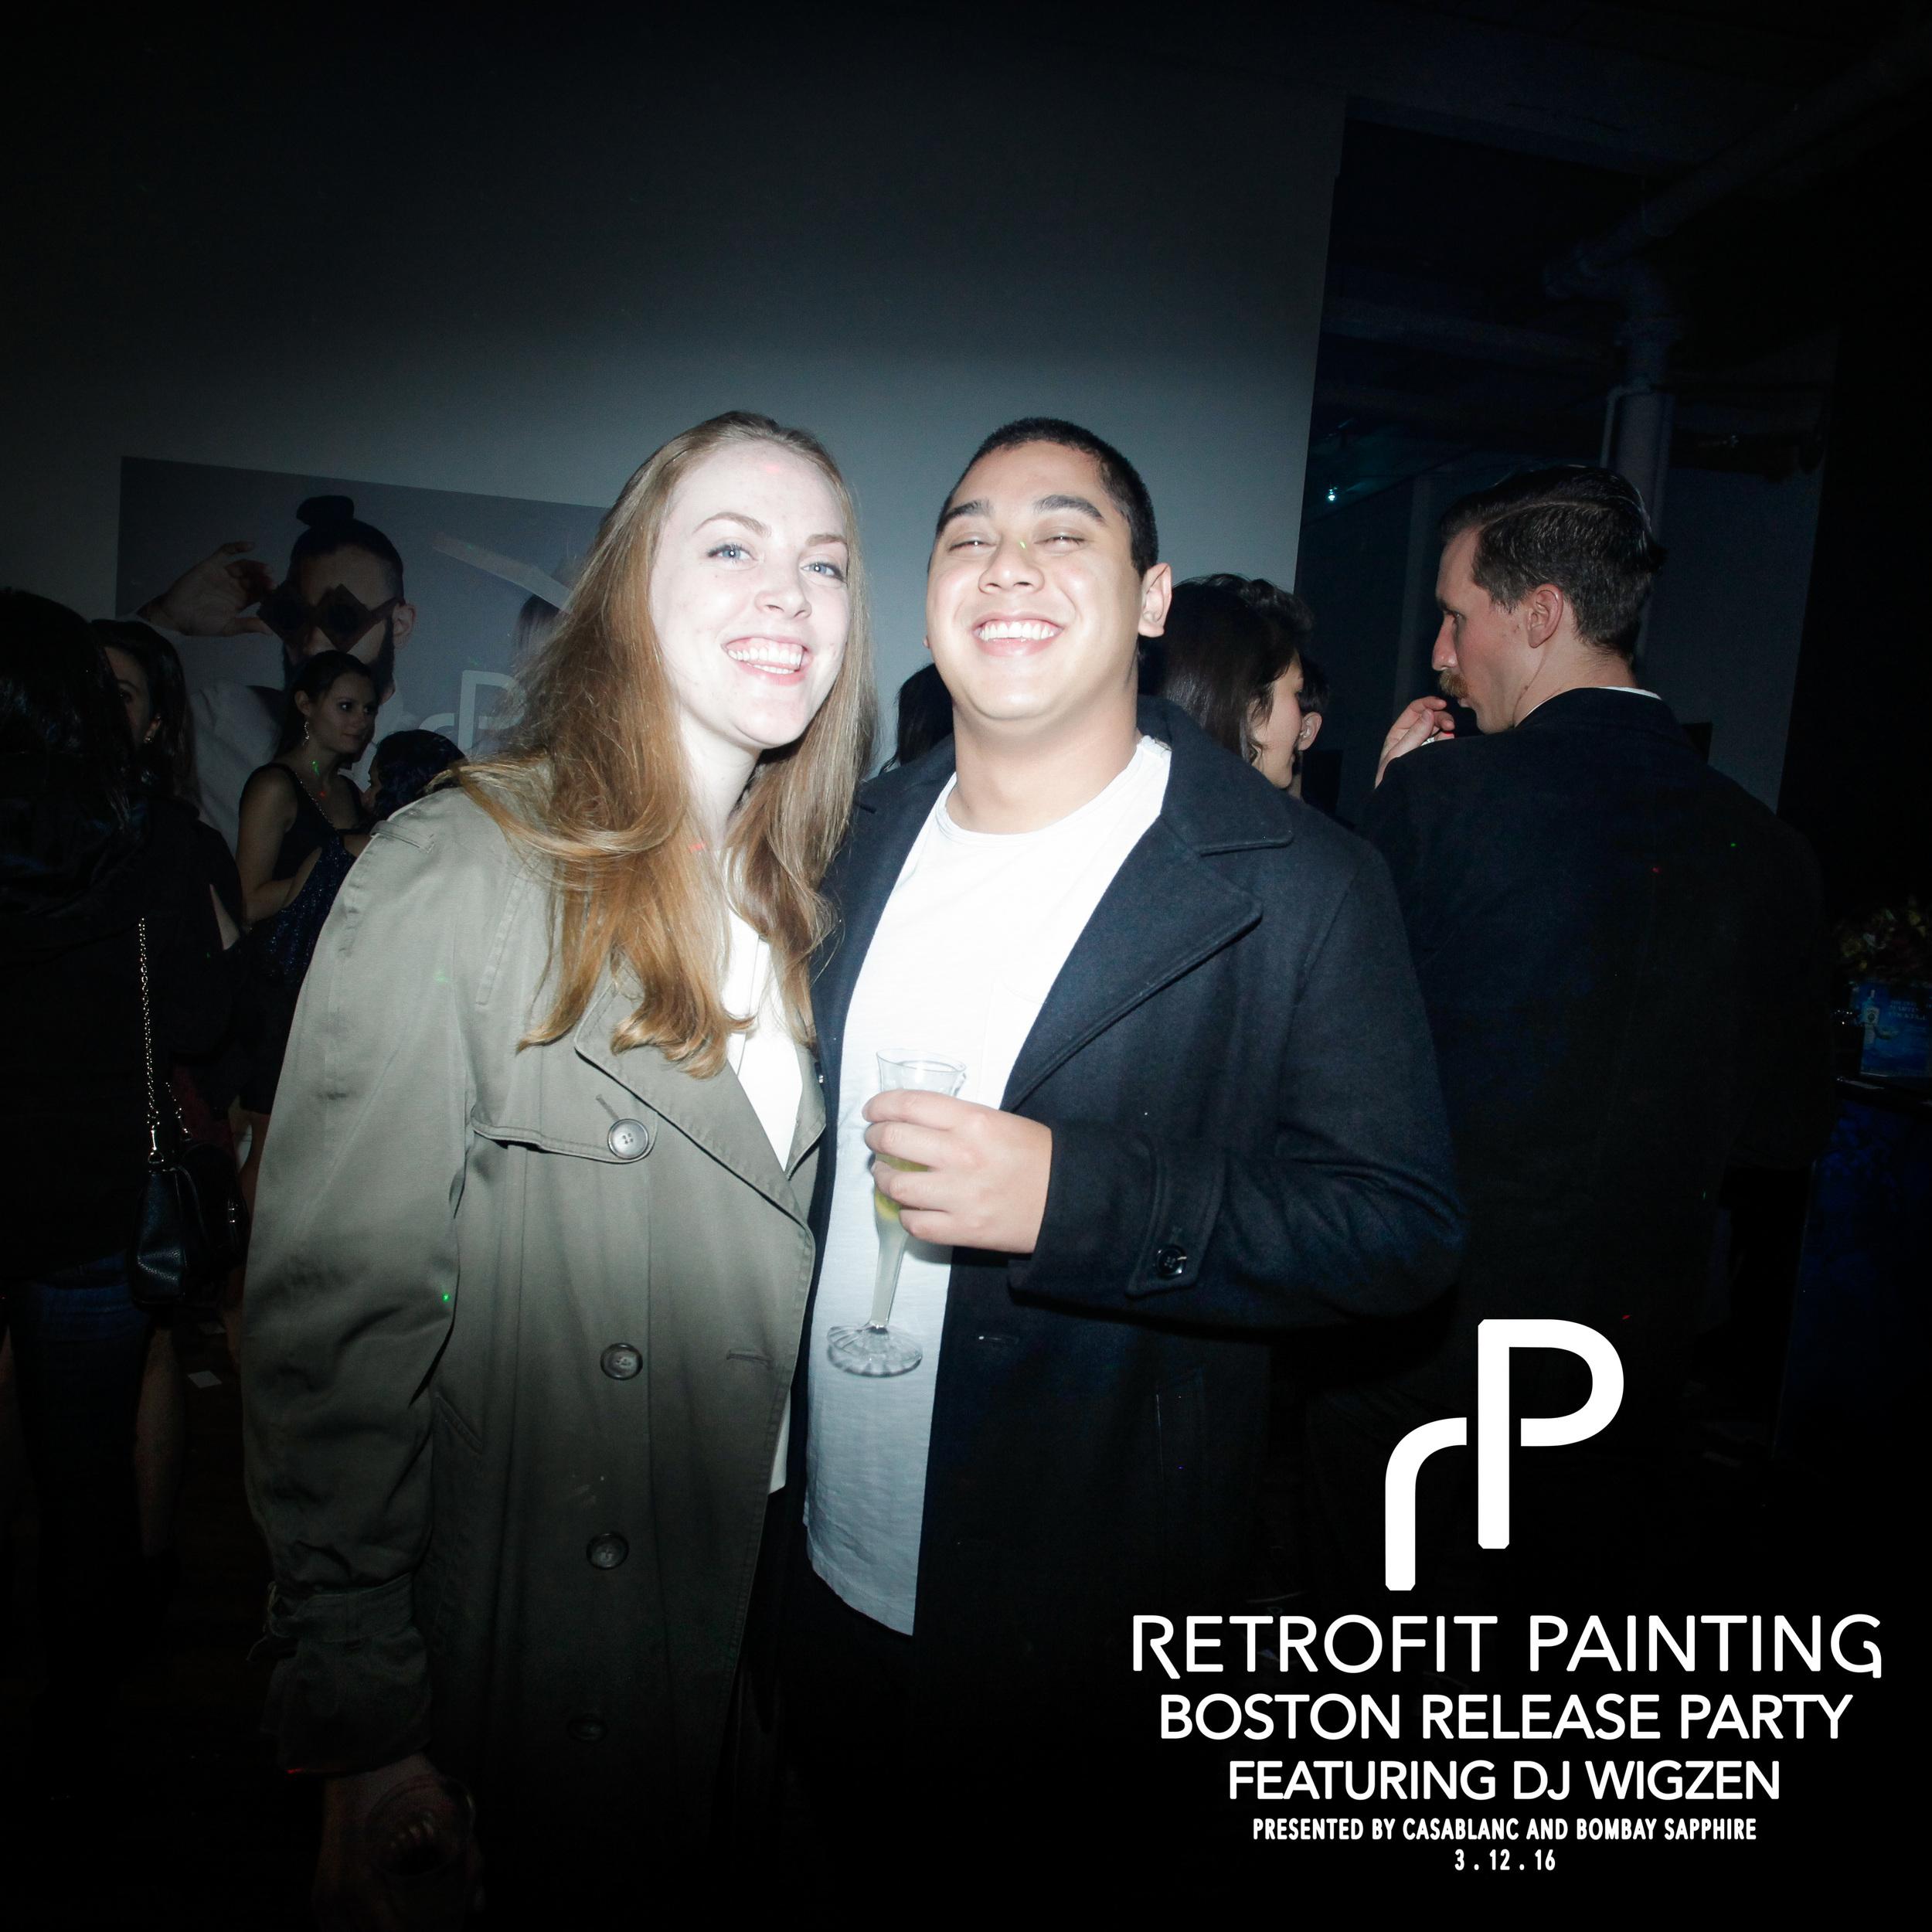 Retrofit Painting Boston Release Party 0134.jpg